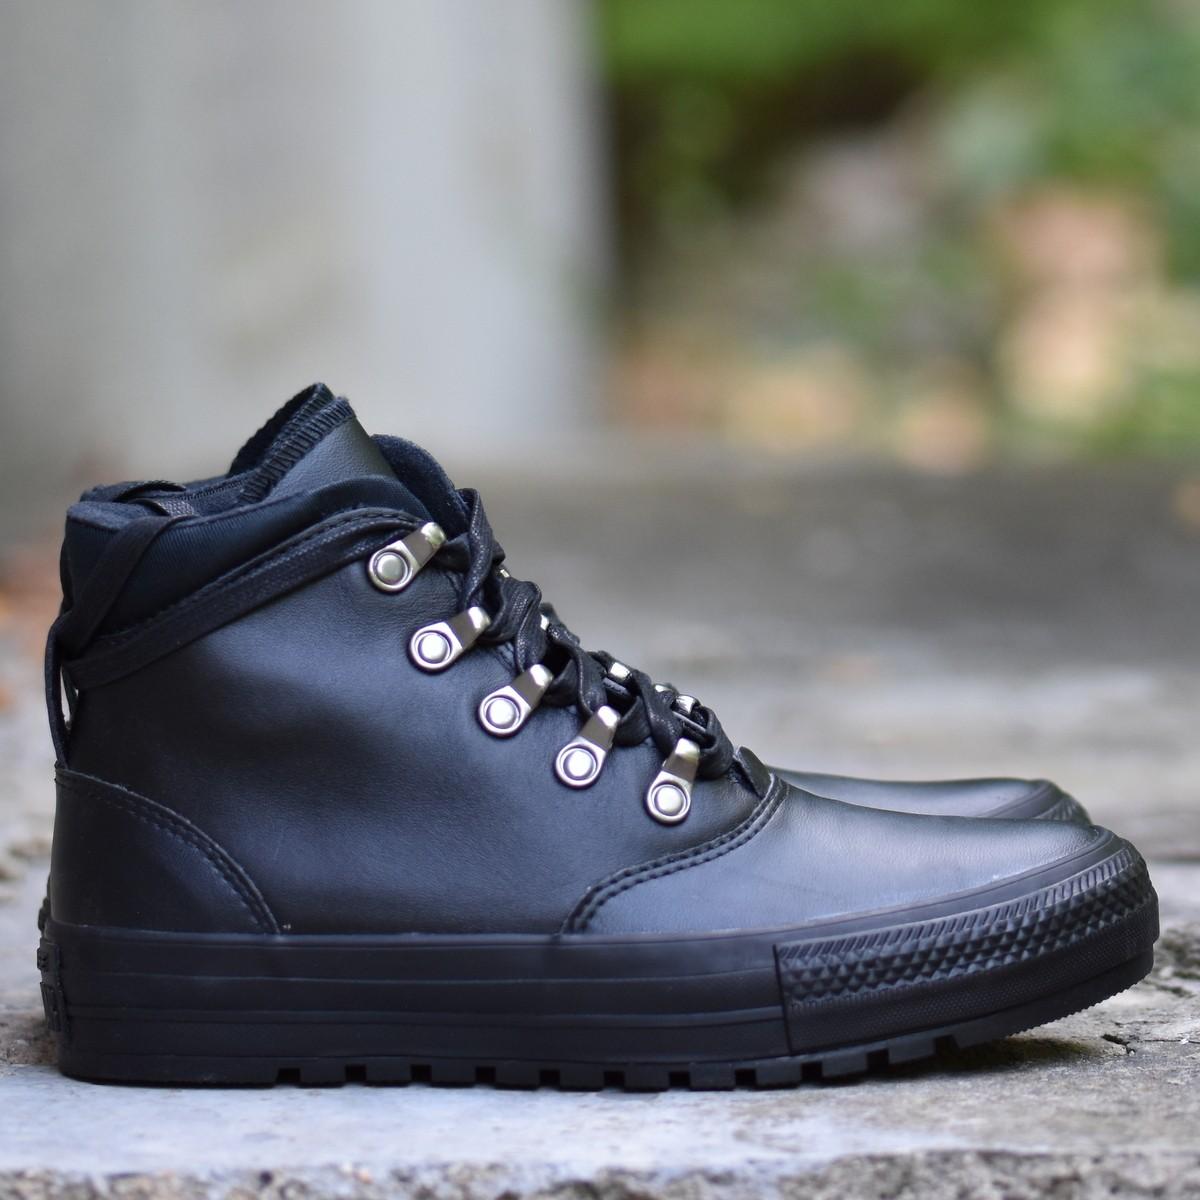 Chuck Taylor All Star Ember Boot Dámské zimní boty 78a8397a33